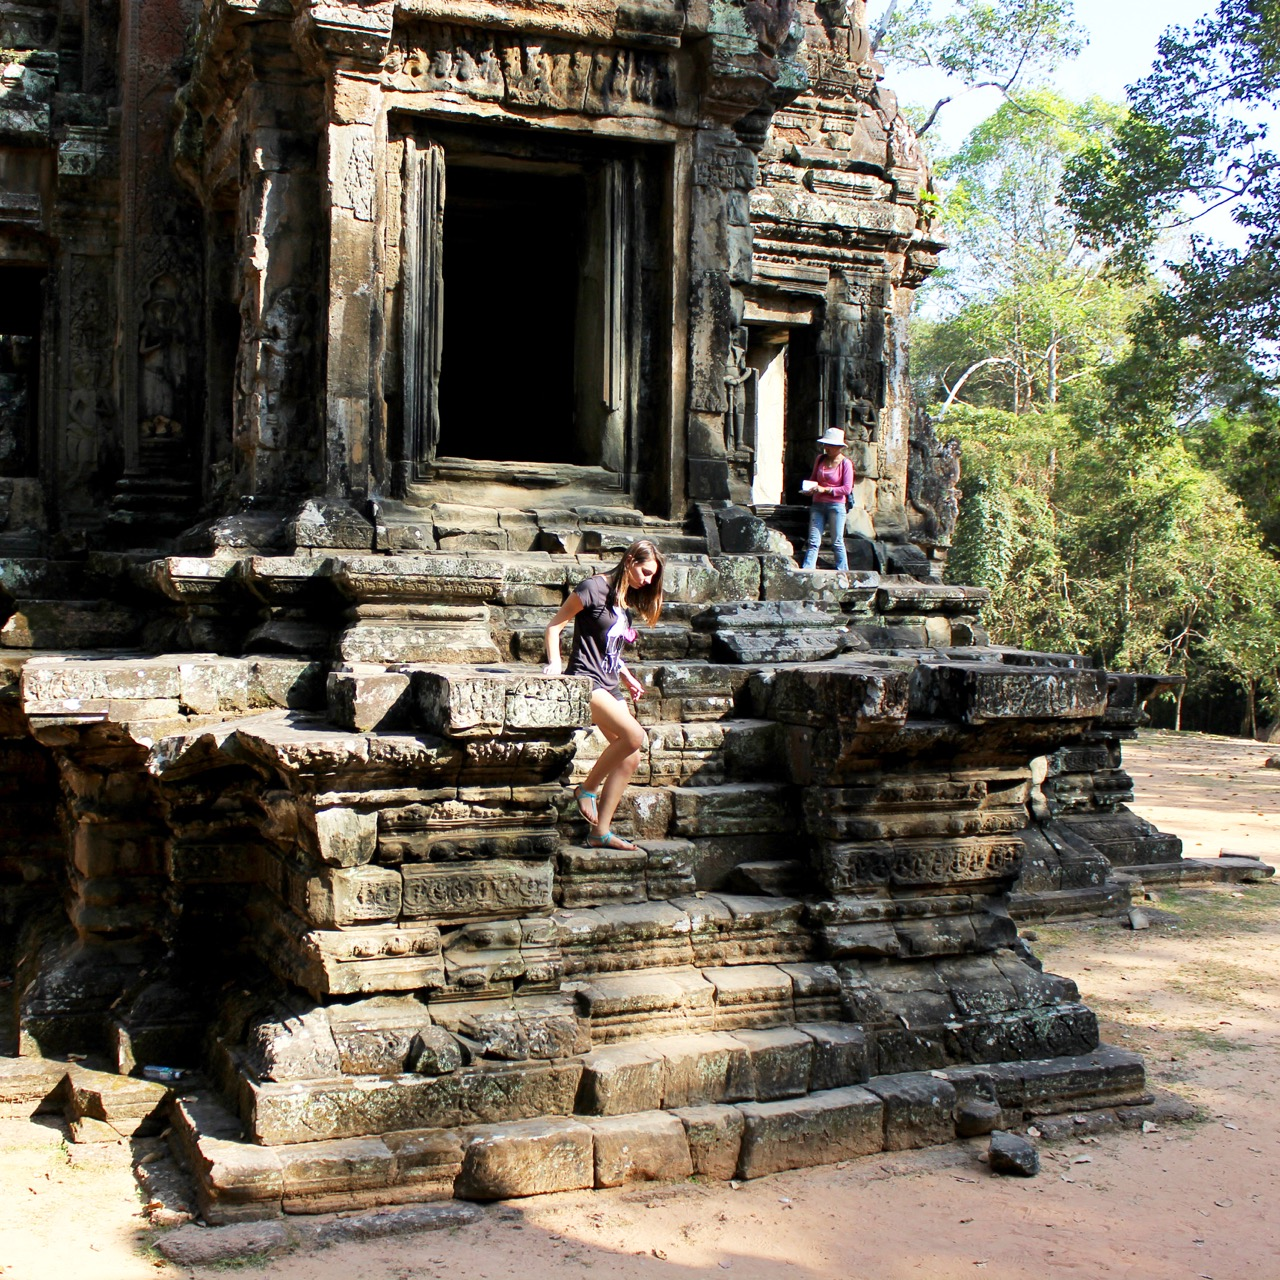 Angkor Wat, Siem Reap, Cambodia - 29